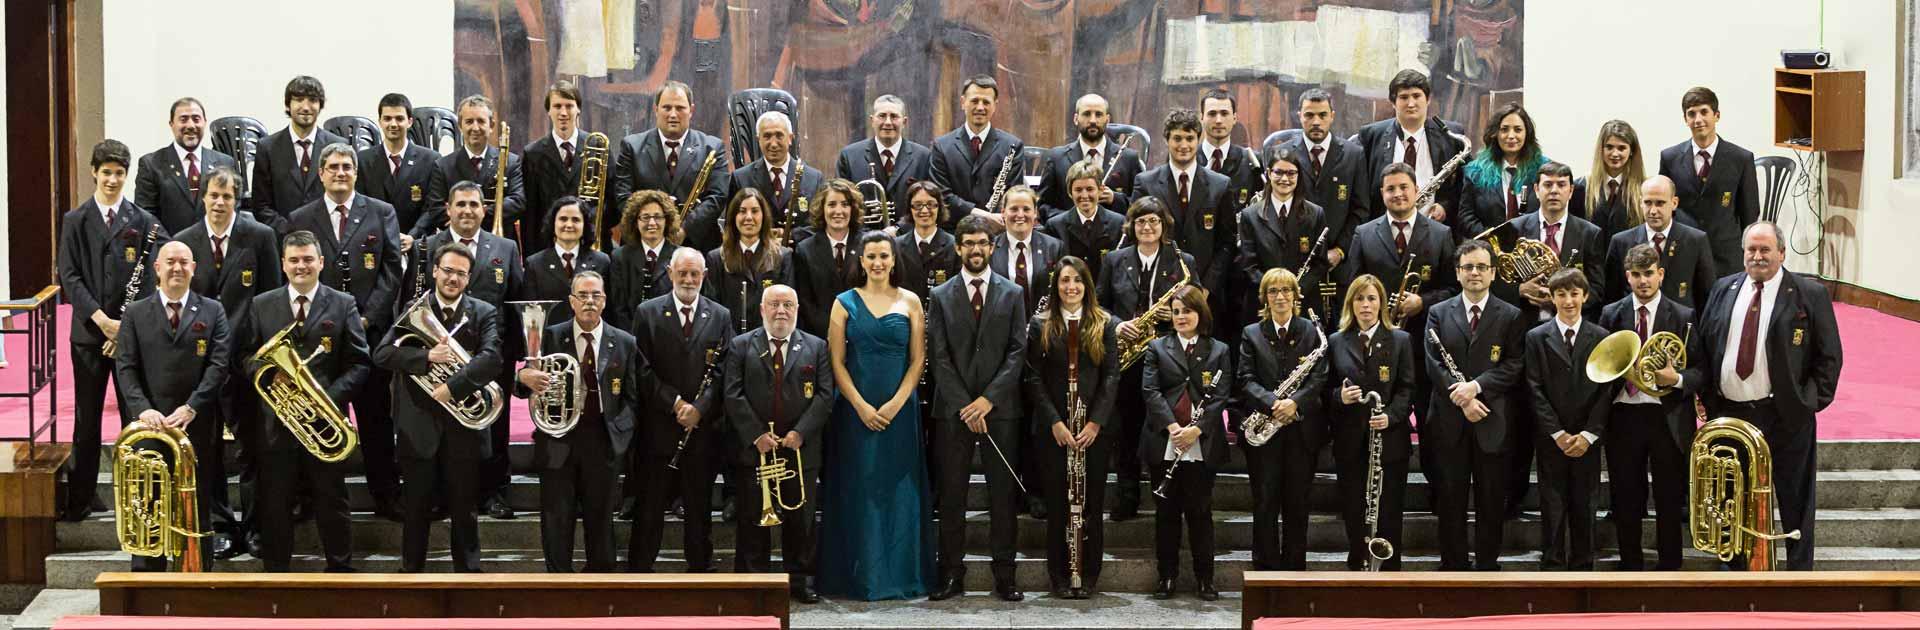 banda de música de Errenteriabanda de música de Errenteria